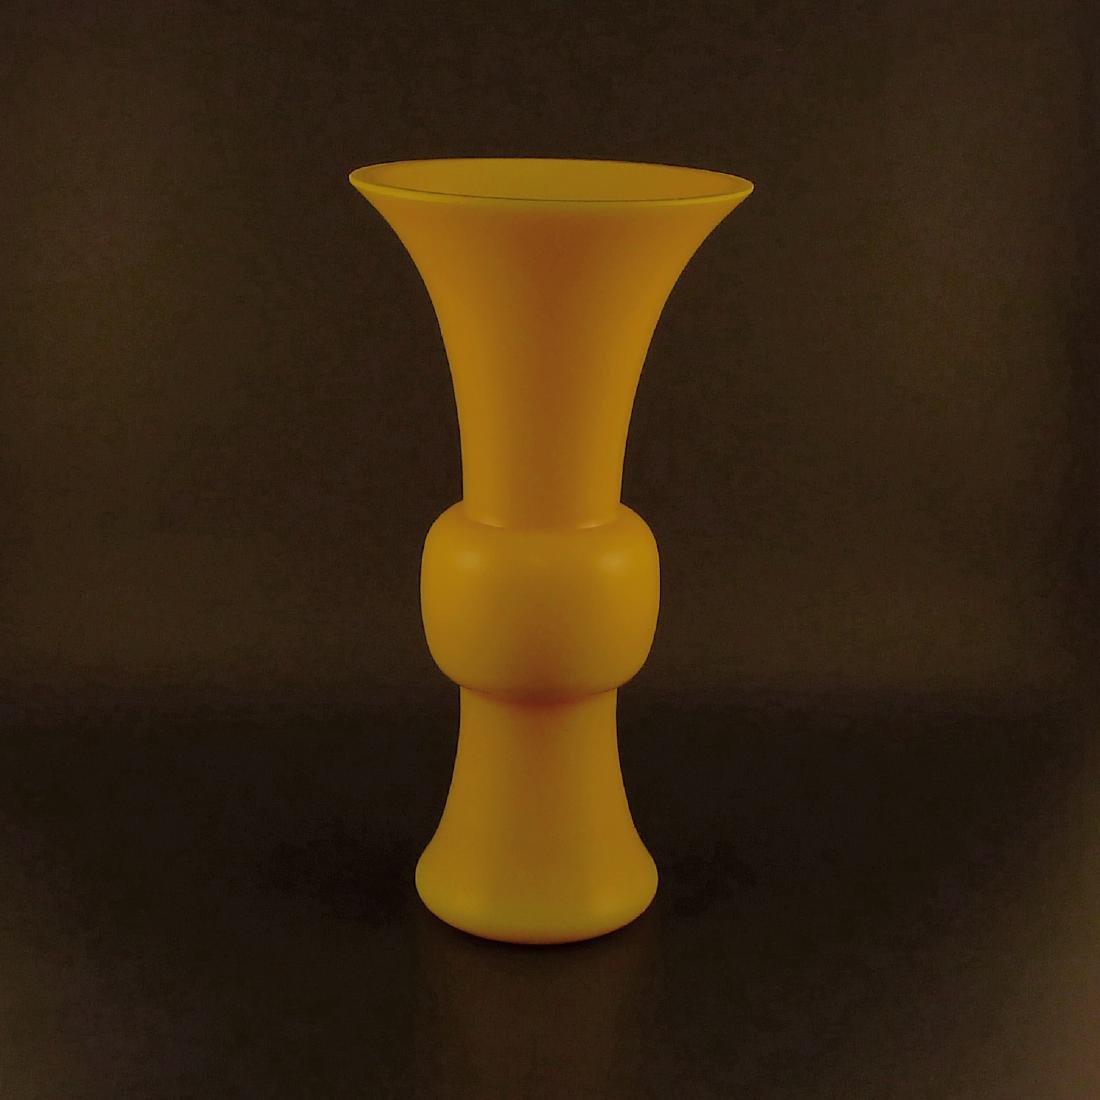 Old Beijing Yellow Glass Vase